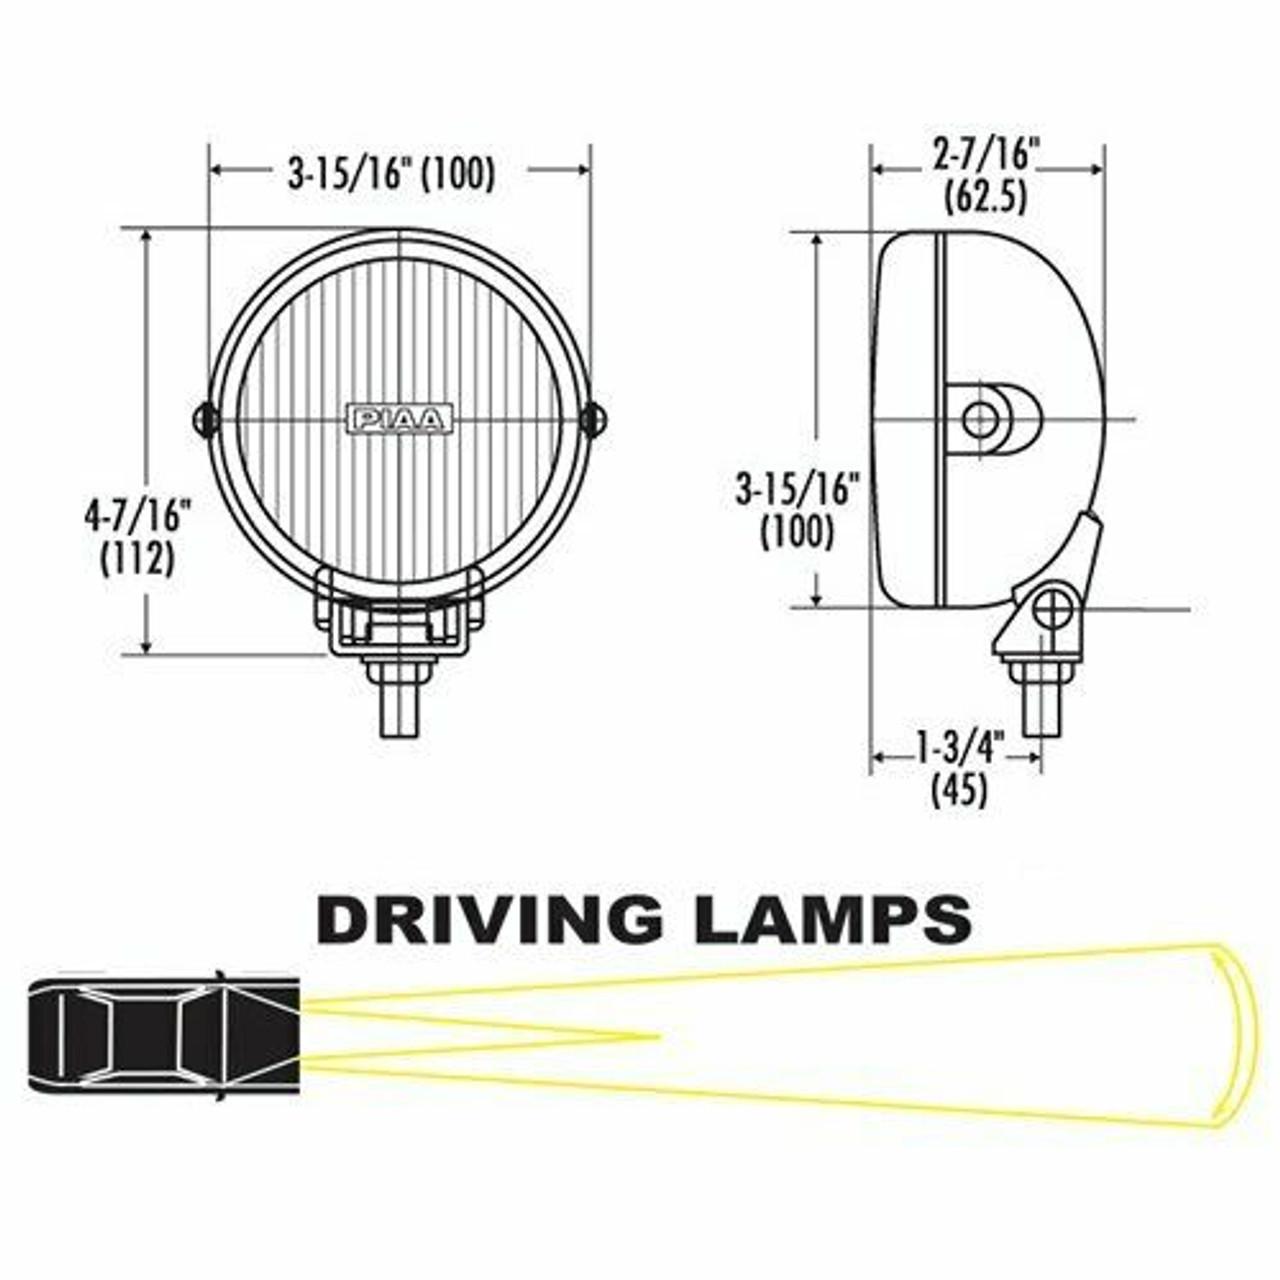 PIAA 510 SMR Driving XTreme White Plus 55w Halogen Lamp Kit 05192